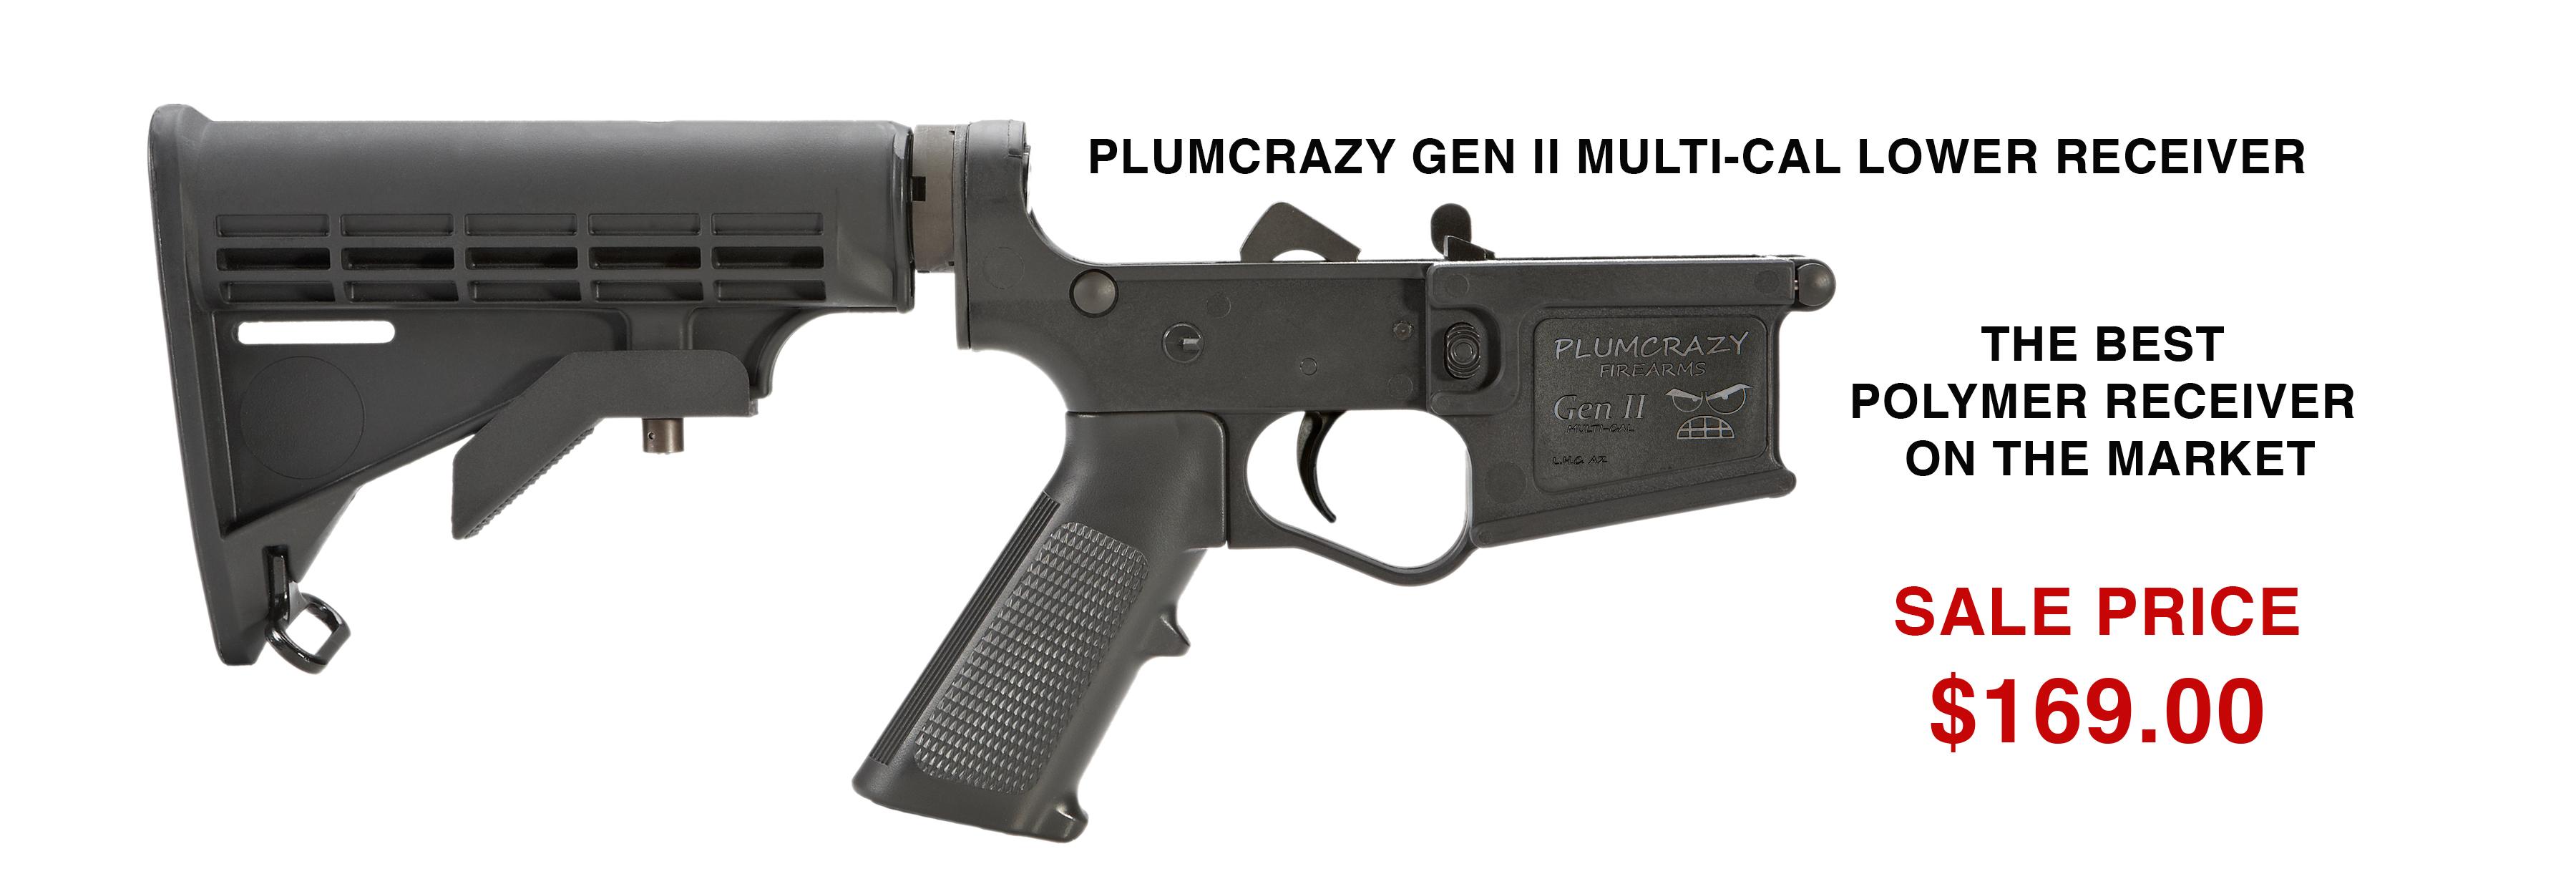 https://www.furyarms.com/products/lower-receivers-furyarms-plumcrazy-gen-ii-complete-lower-receiver